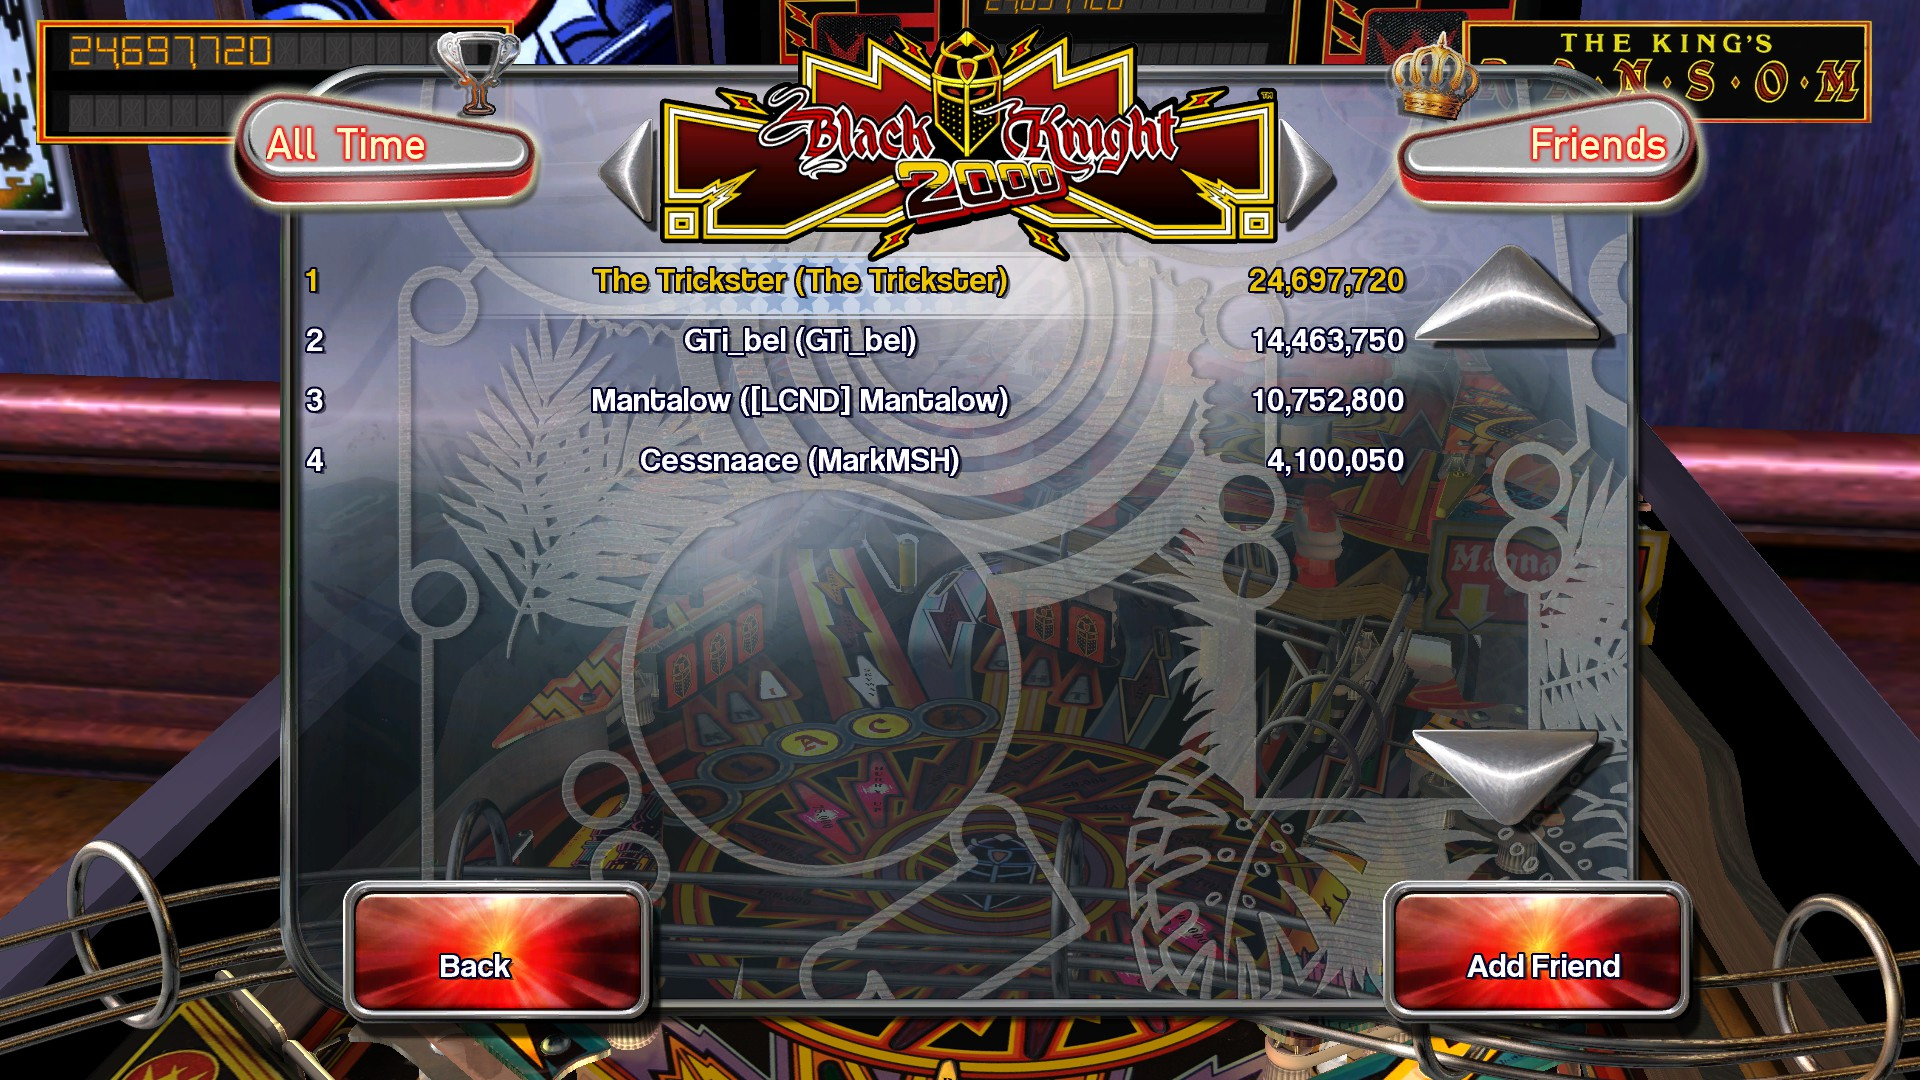 Pinball Arcade: Black Knight 2000 24,697,720 points